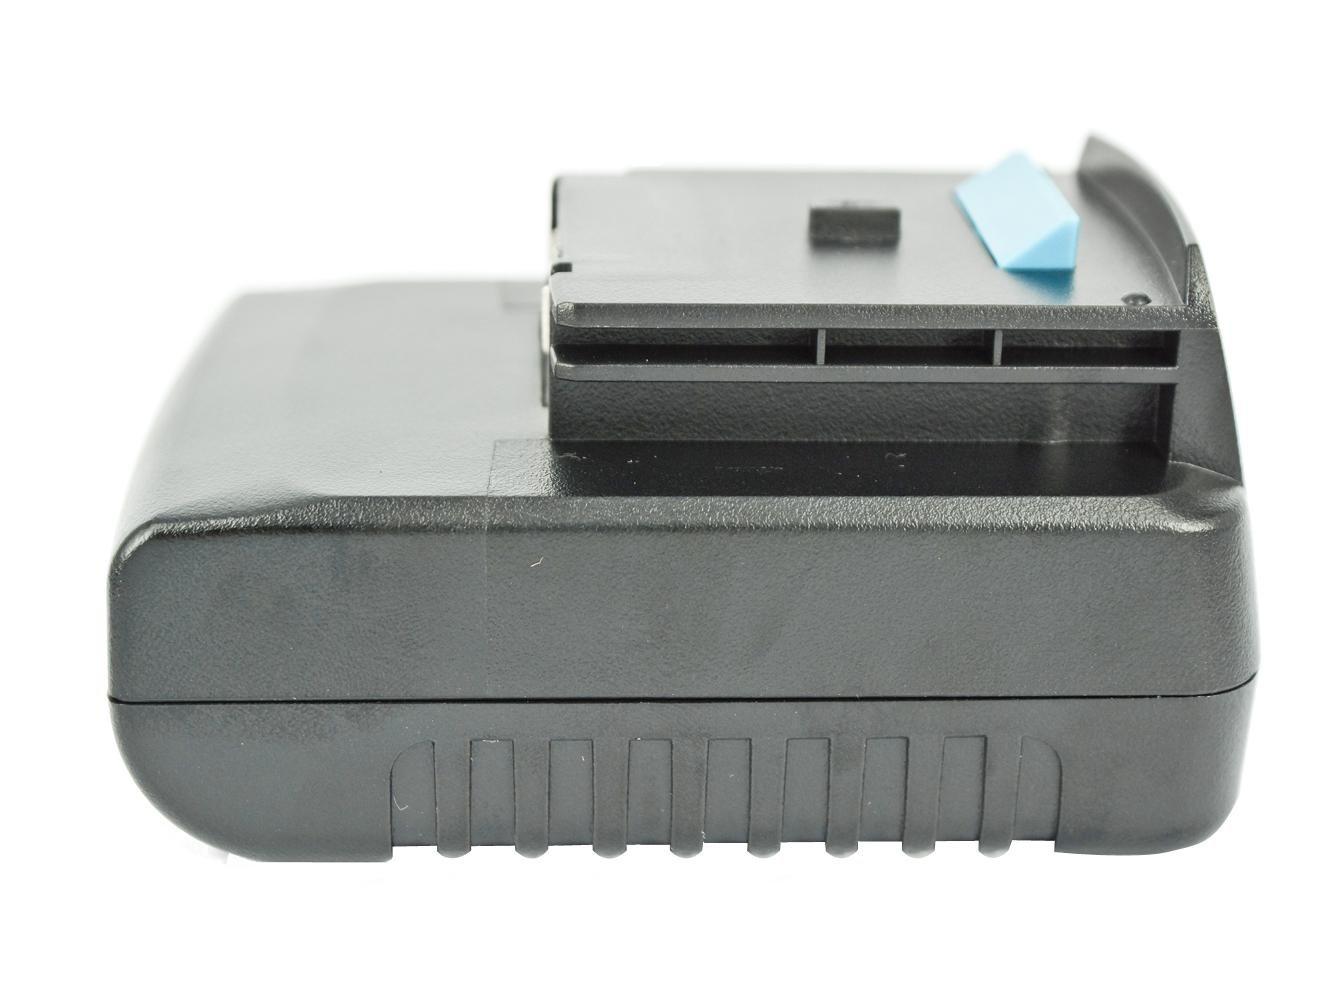 HP186F4L HP188F4LK GPC1800L LB018-OPE GTC610L GLC2500L GTC800L GXC1000L HP186F4LK HP186F4LBK A1518L GKC1817L PowerSmart/® 18V 2000mAh Batterie pour Black /& Decker GKC1000L HP188F4LBK A1118L